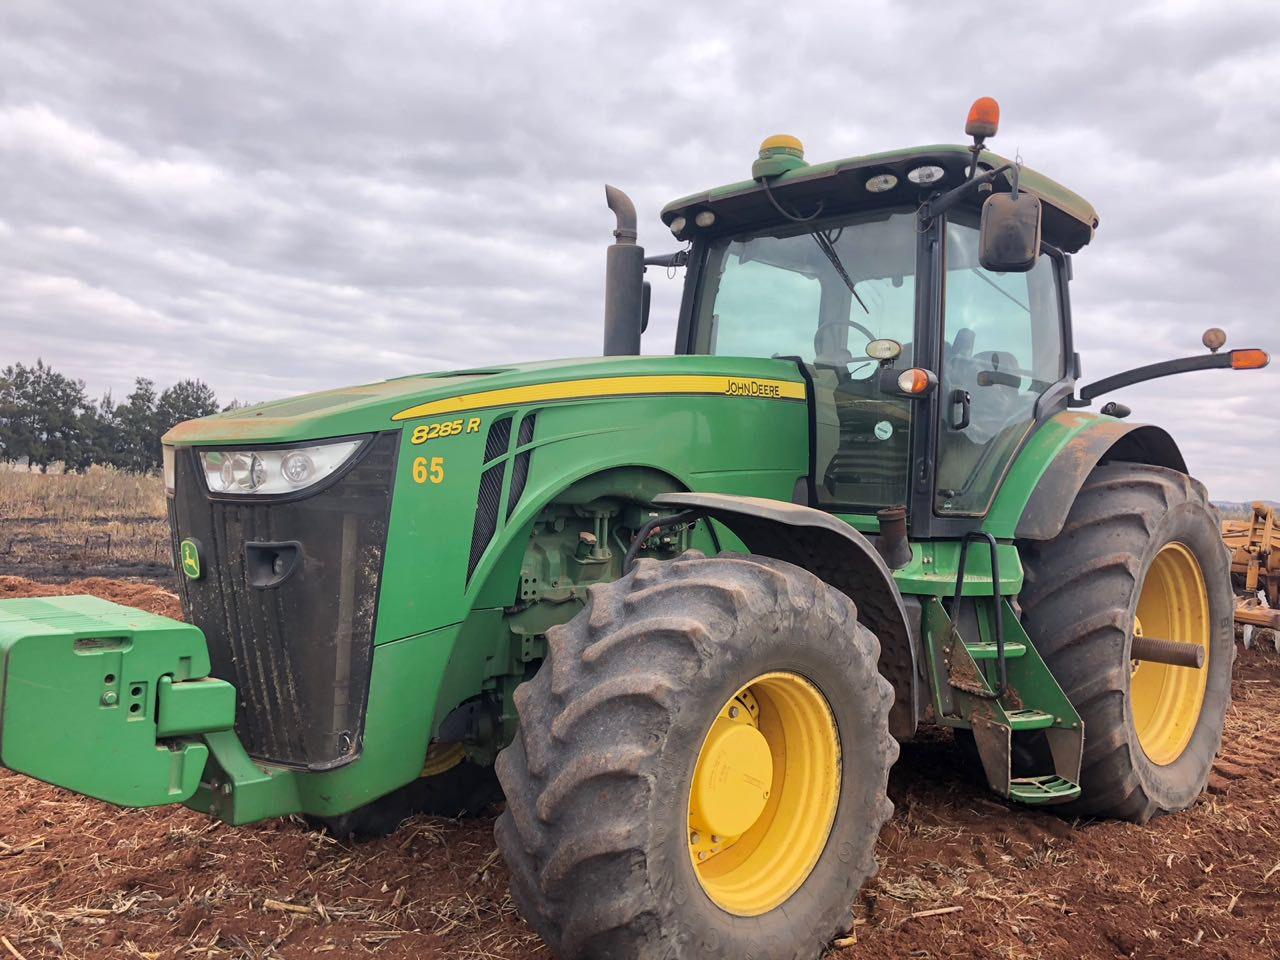 John Deere For Sale >> John Deere Tractor For Sale Junk Mail